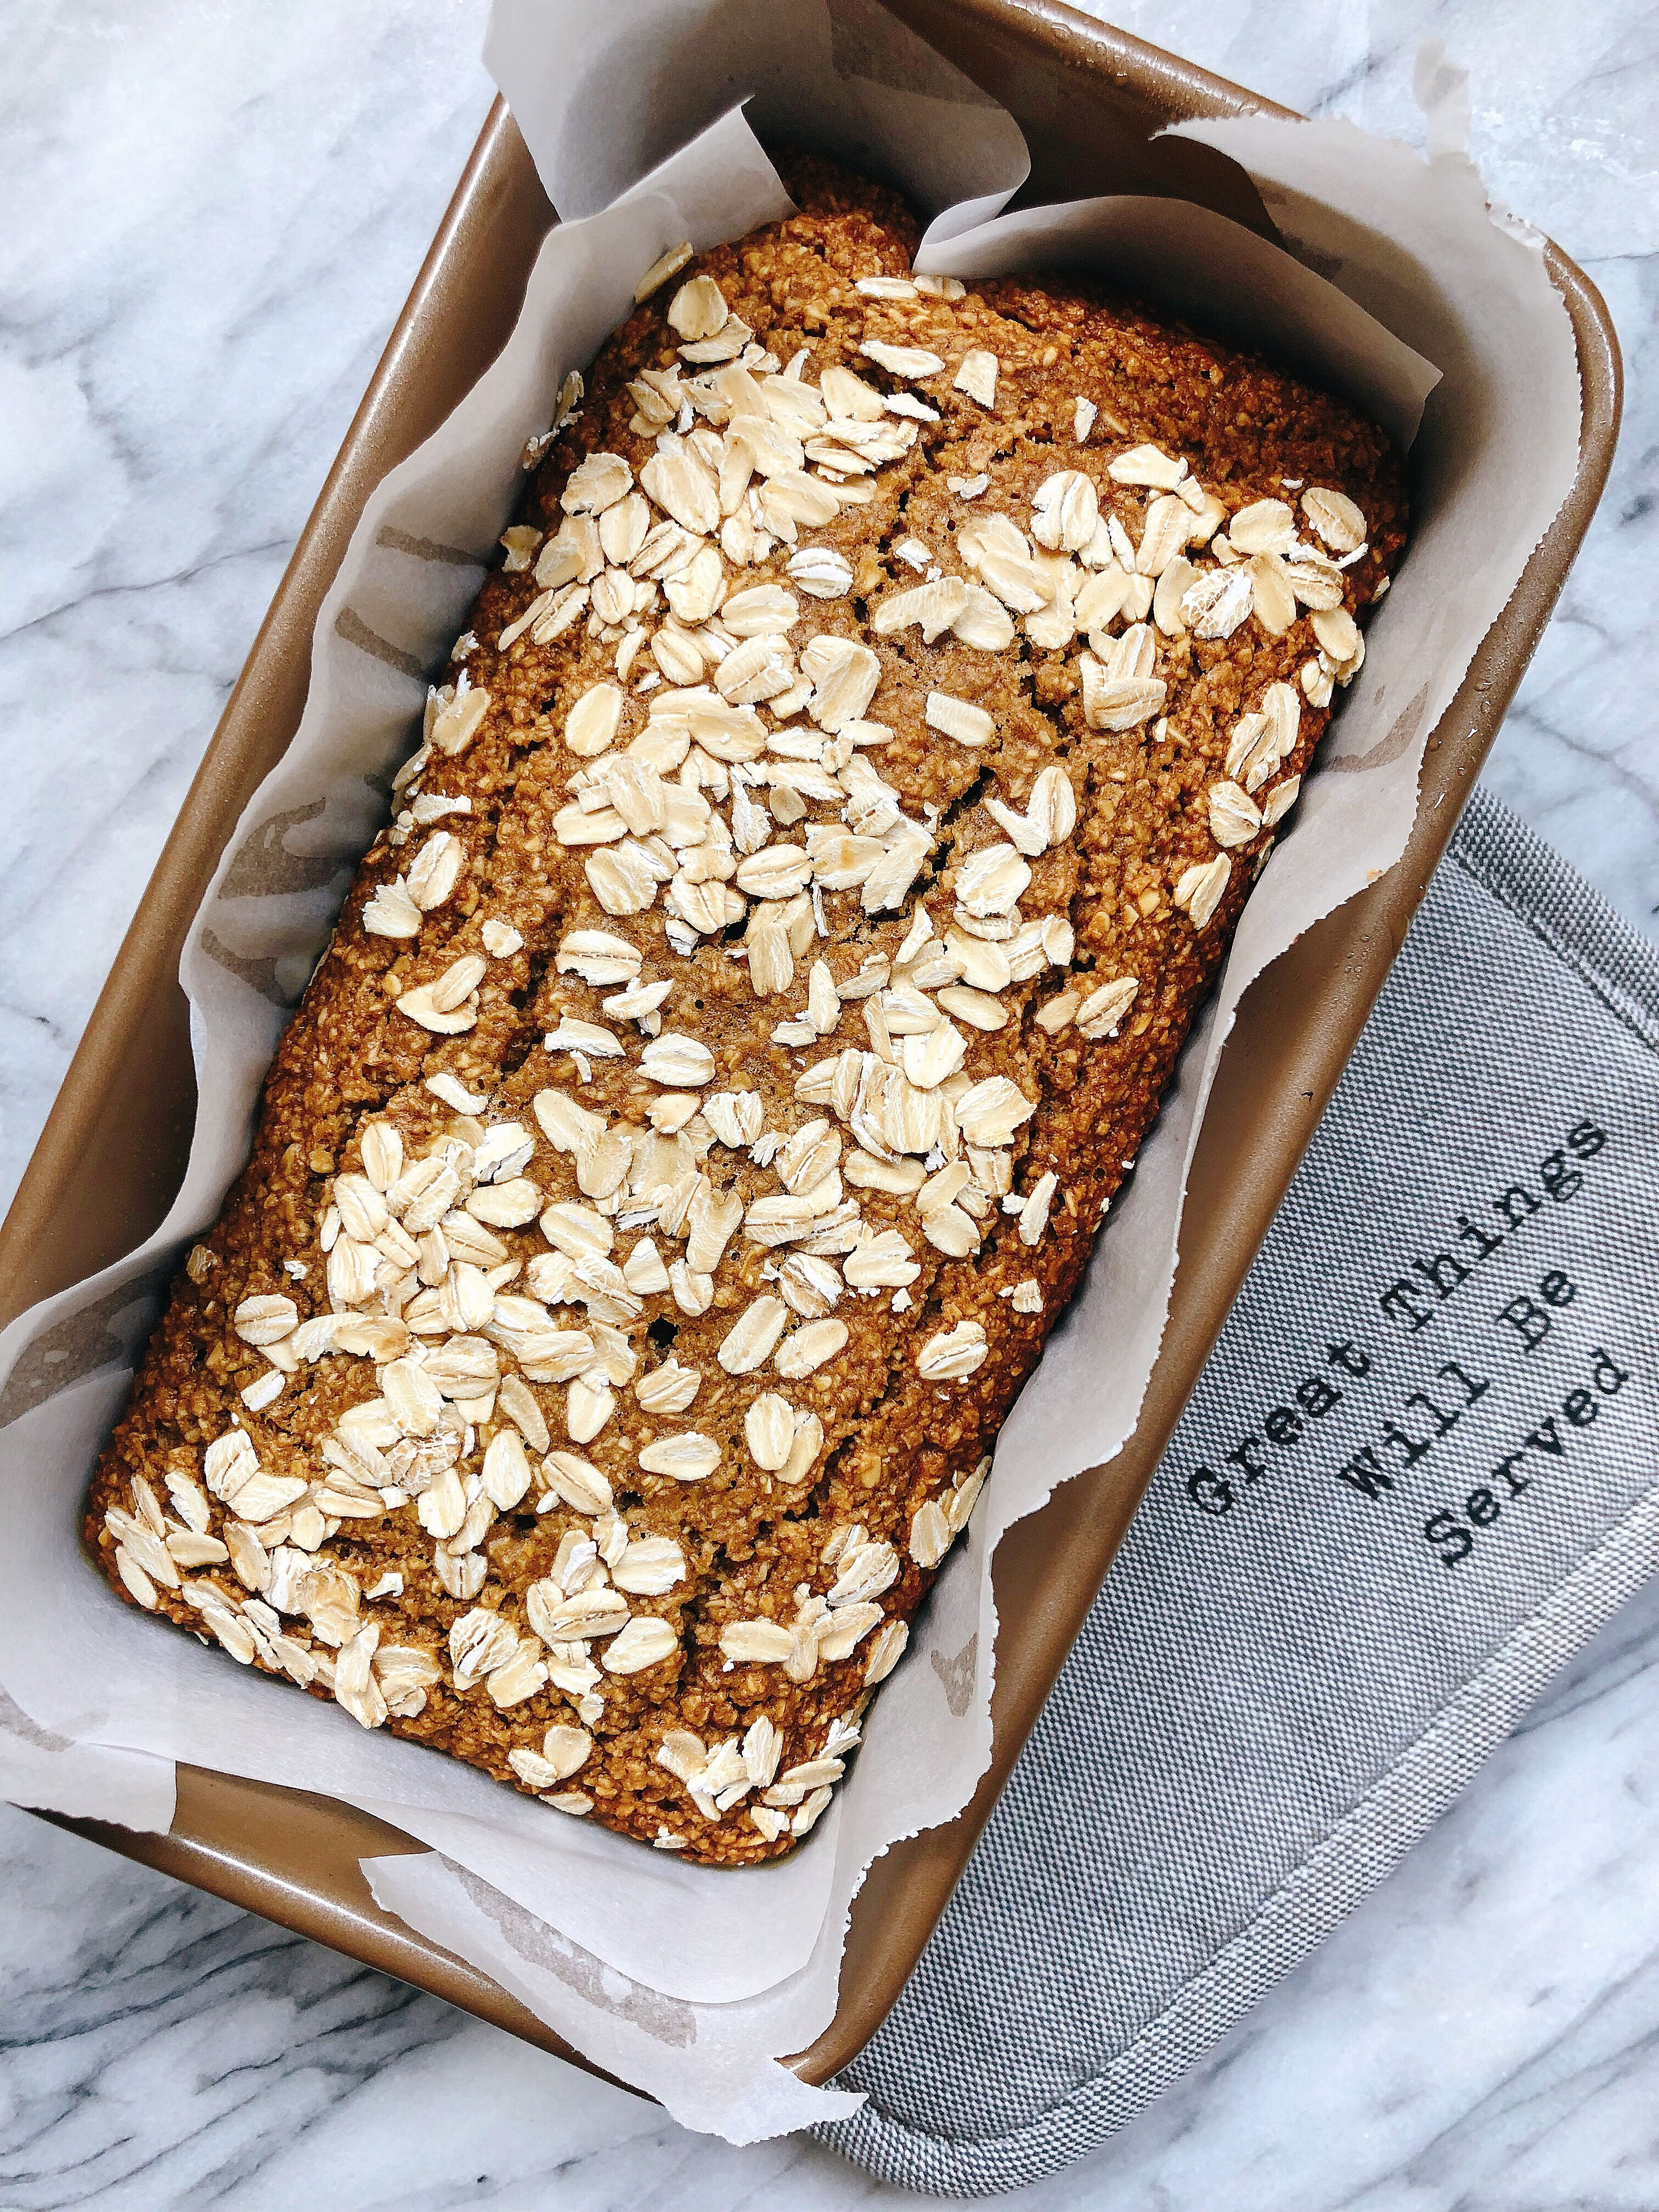 Gluten Free Oat Bread | Gluten free oat bread, Gluten free oats, Gluten free milk